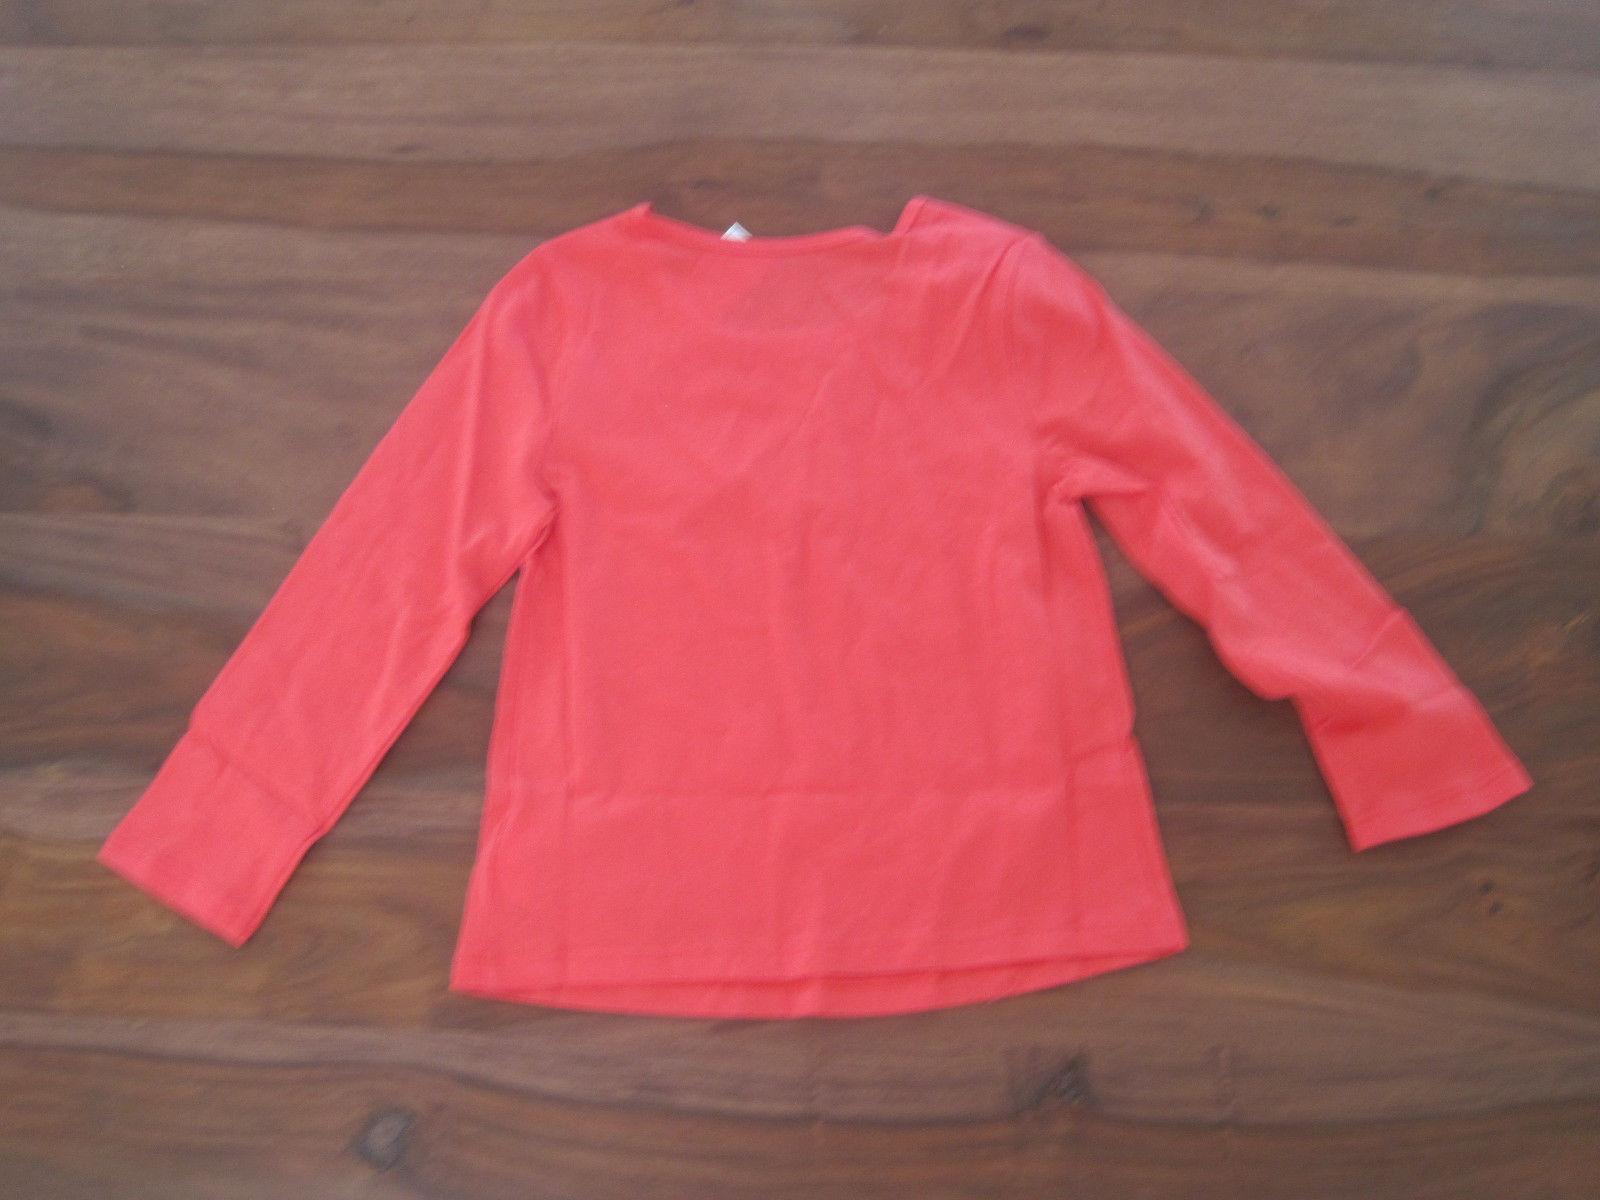 Gap Baby Girl Tee Top  Sz 4 Orange Ruffle Long Sleeve Roun Neck 100%  Cotton New image 2